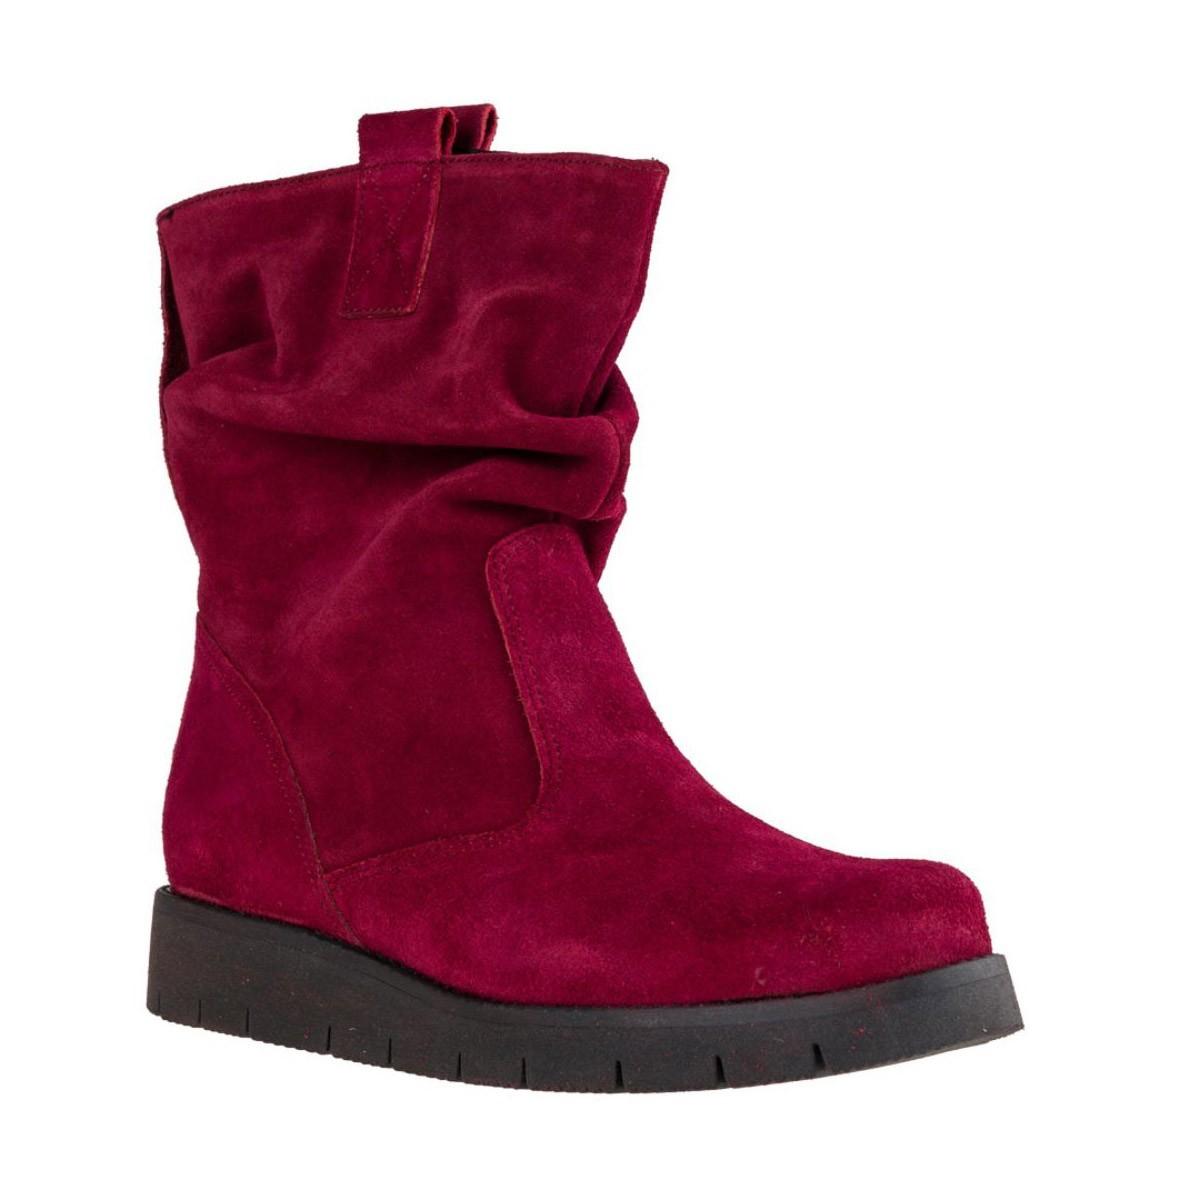 bbb157f23c3 Fashion Icon Γυναικεία Παπούτσια Μποτάκια 09-505 Μπορντώ Fashion Icon  09-505 Mπορντώ BagiotaShoes